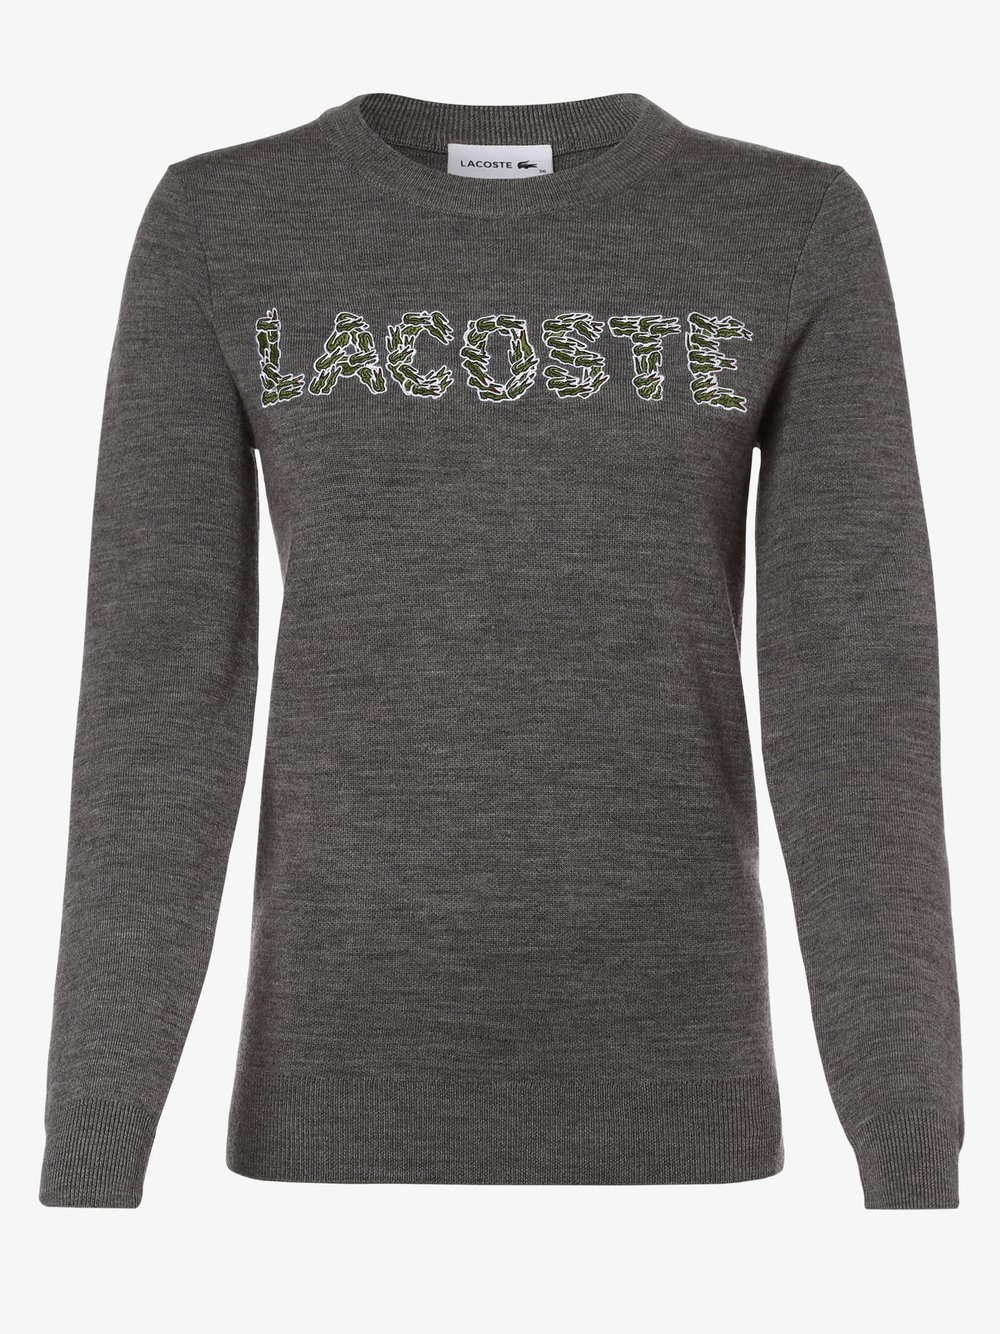 Lacoste - Sweter damski, szary